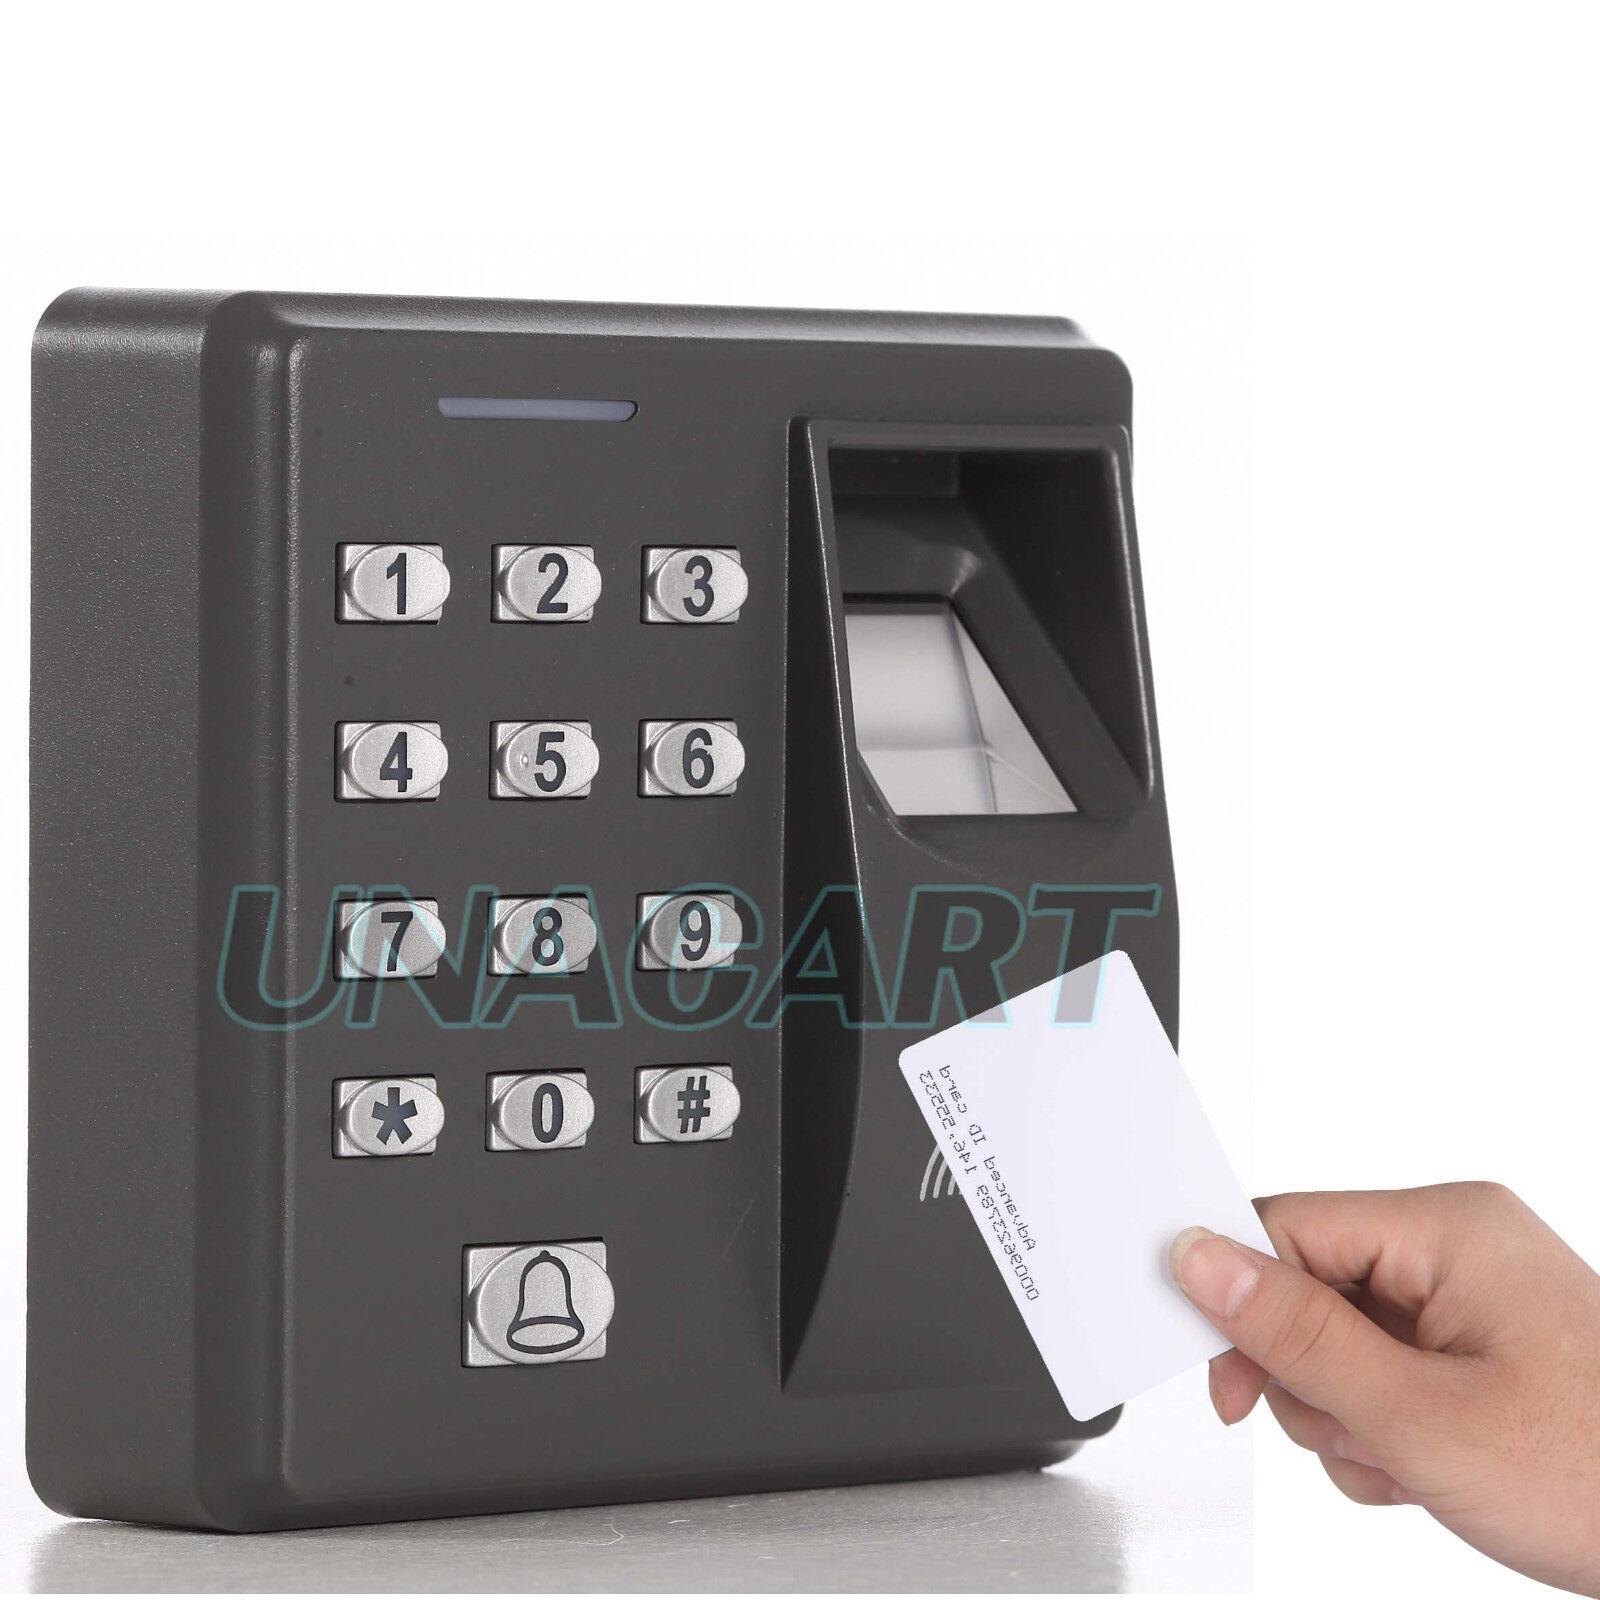 Fingerprint Amp Rfid Id Card Reader Access Control System